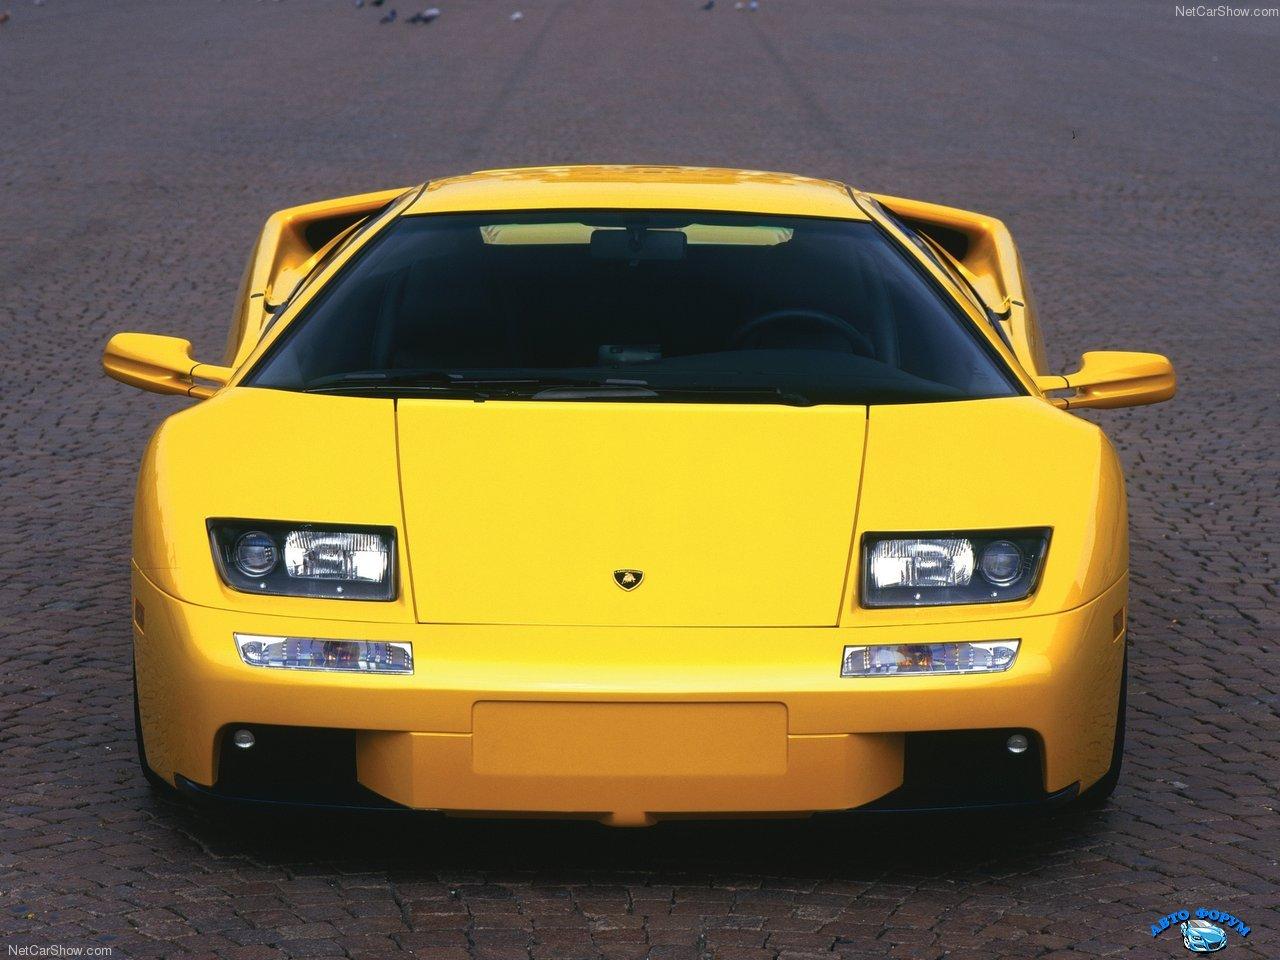 Lamborghini-Diablo_6.0_2001_1280x960_wallpaper_07.jpg